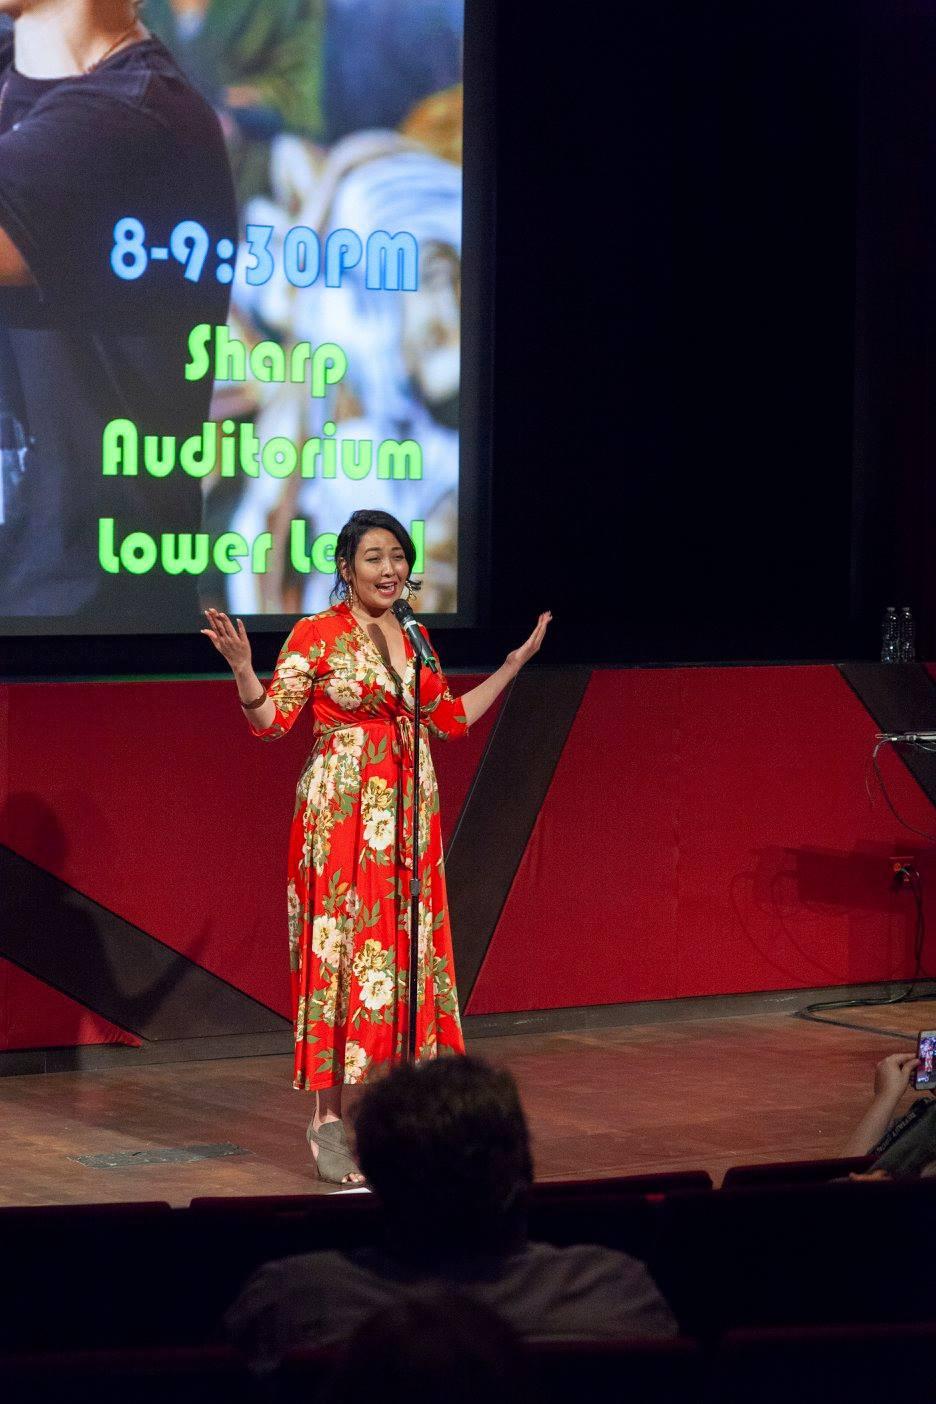 Kimberly performing - untitled spoken word.jpg